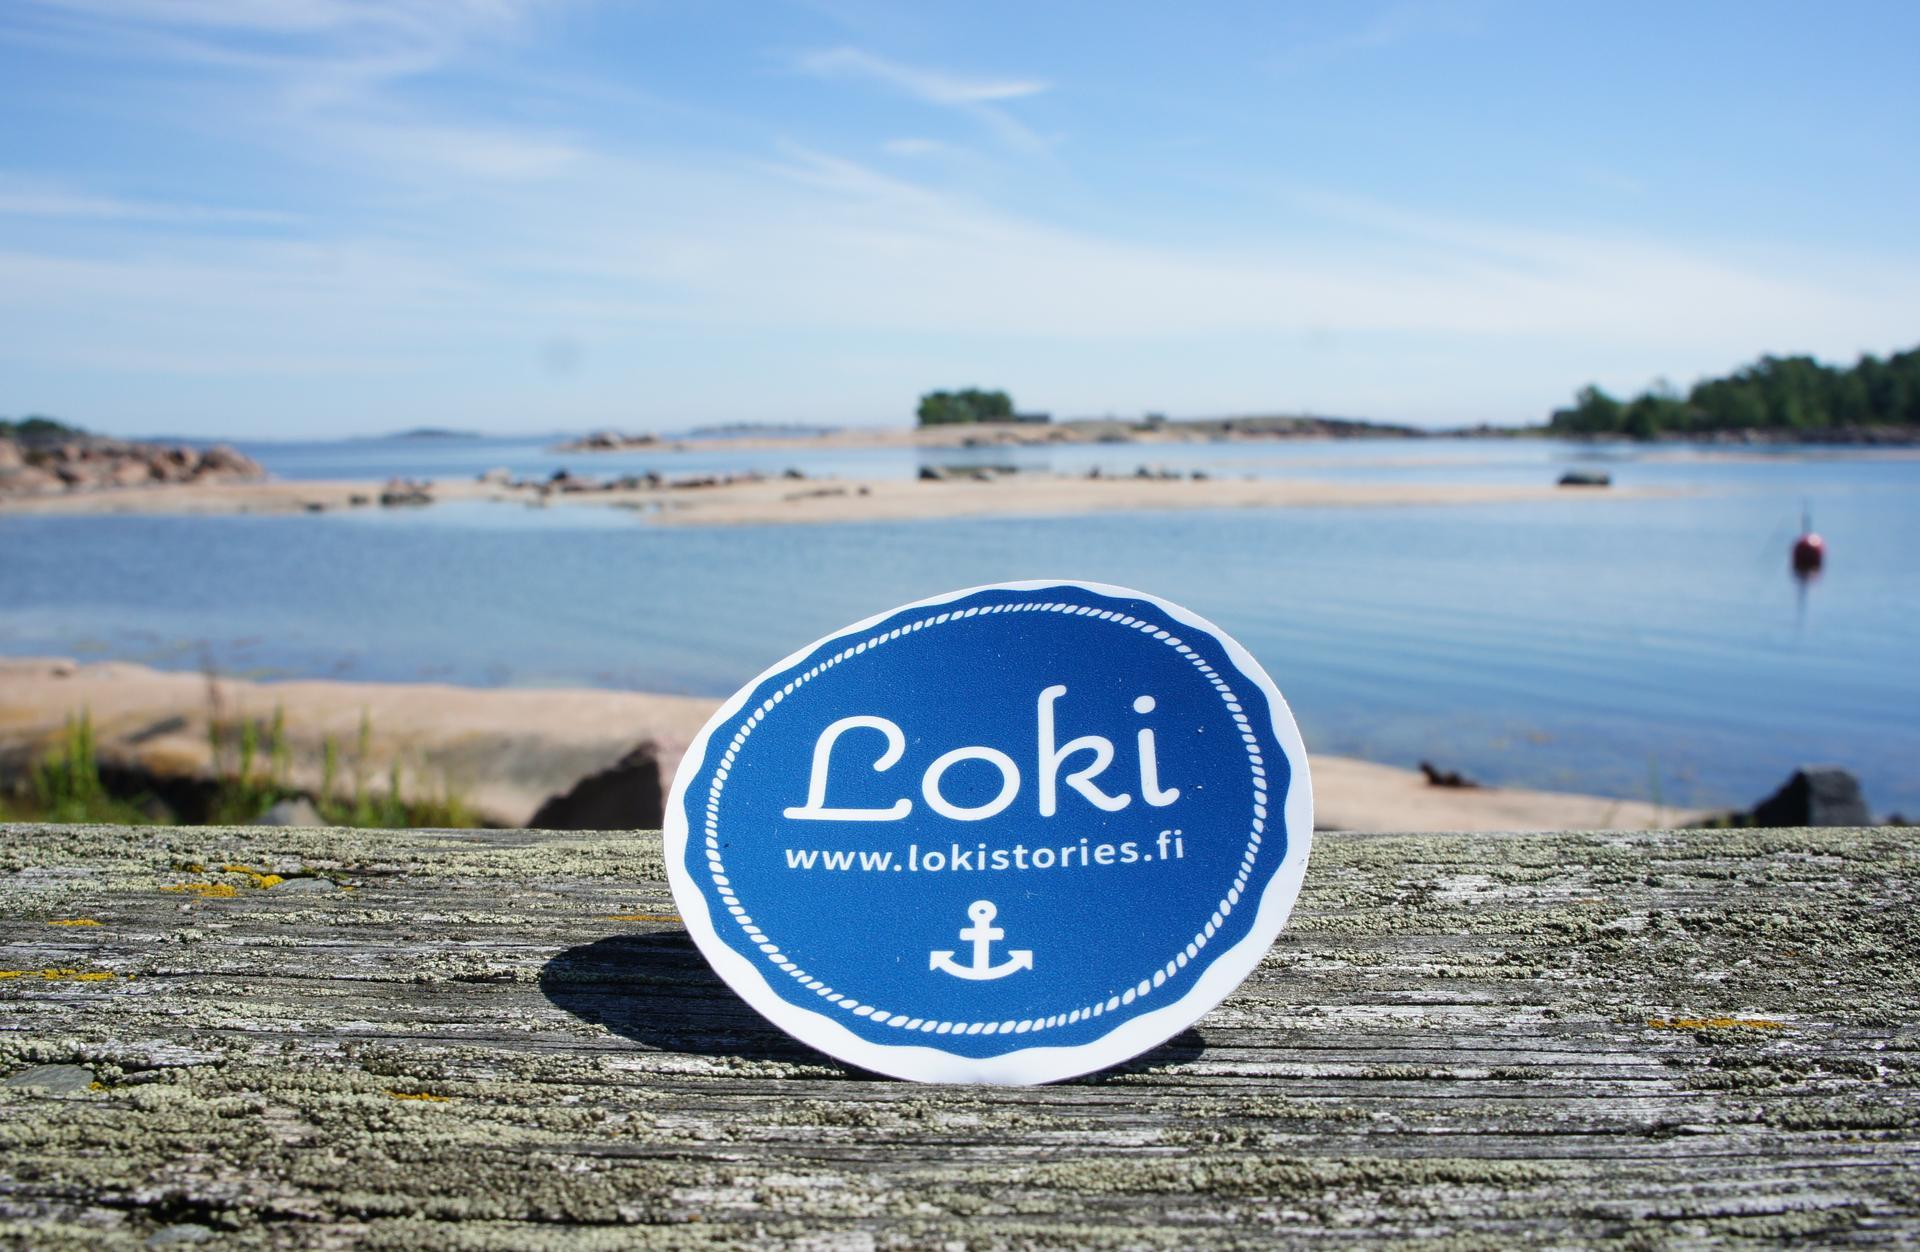 www.lokistories.fi